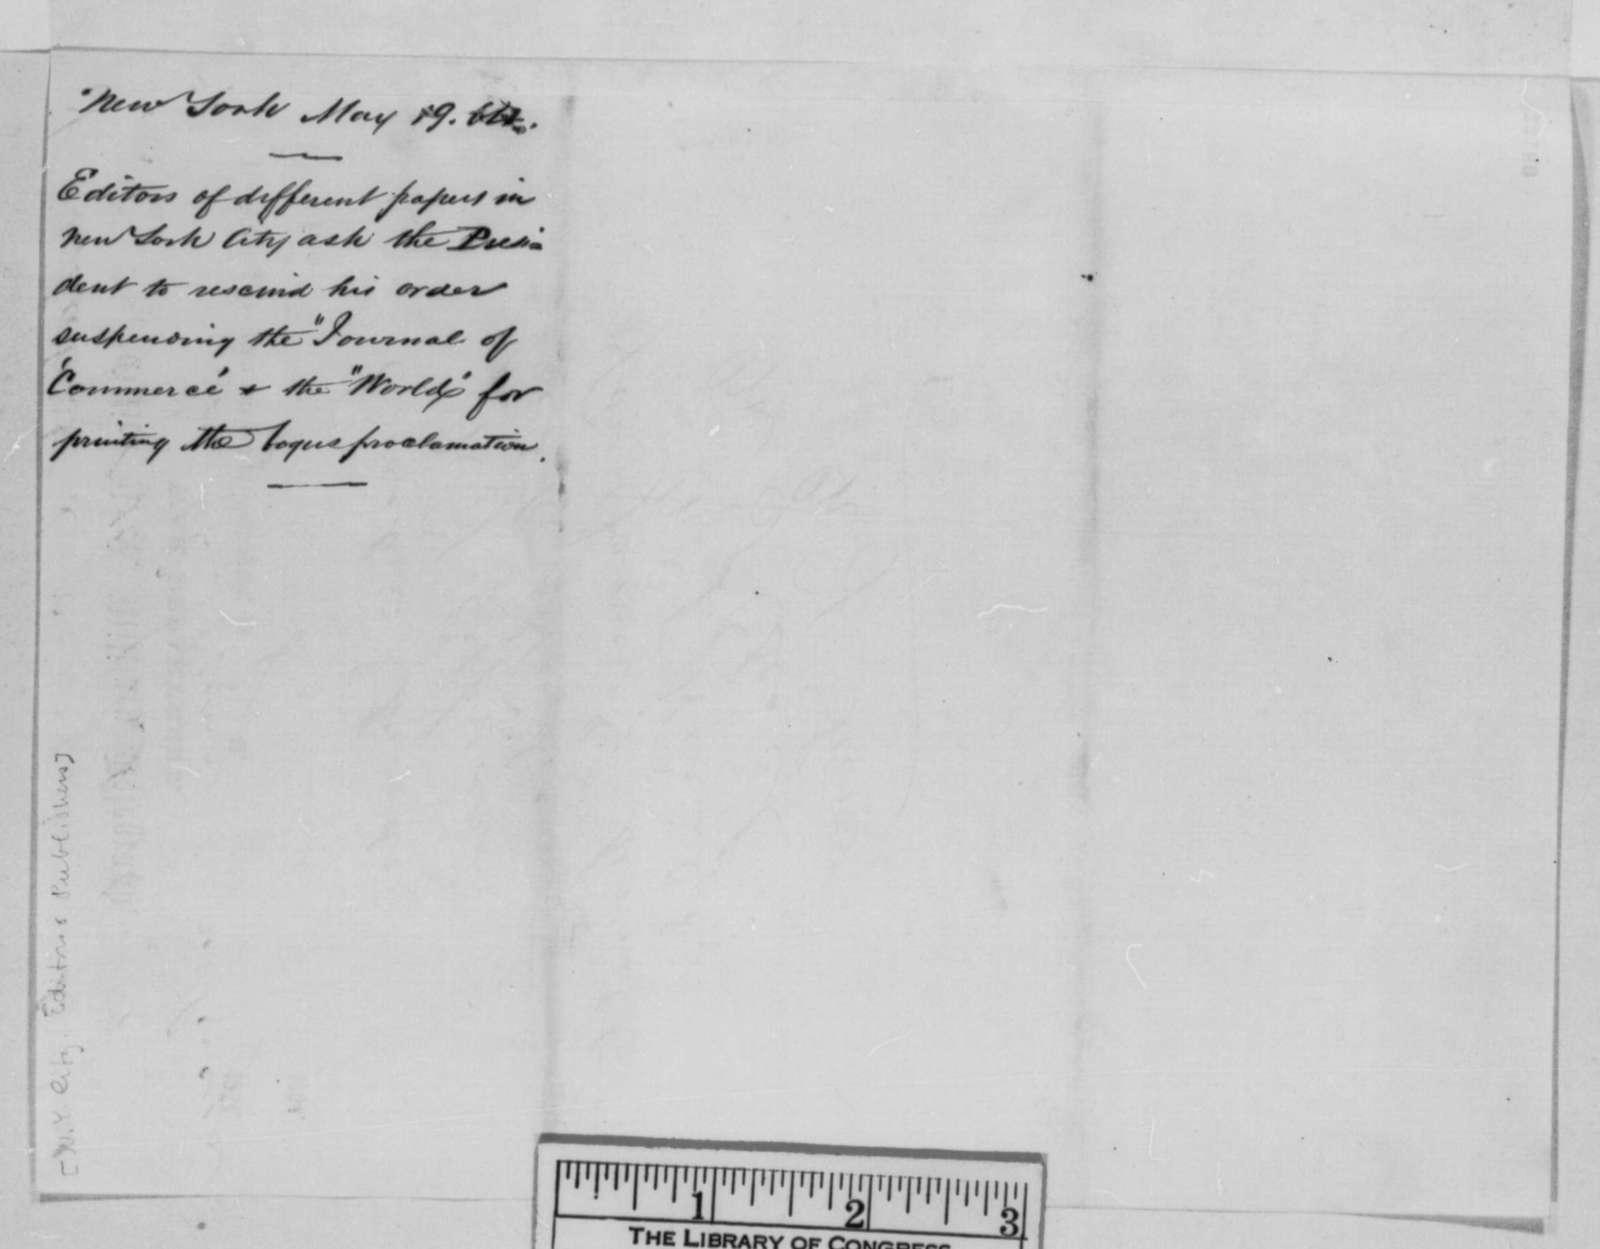 Sydney H. Gay, et al. to Abraham Lincoln, Thursday, May 19, 1864  (Telegram concerning publication of fraudulent proclamation)